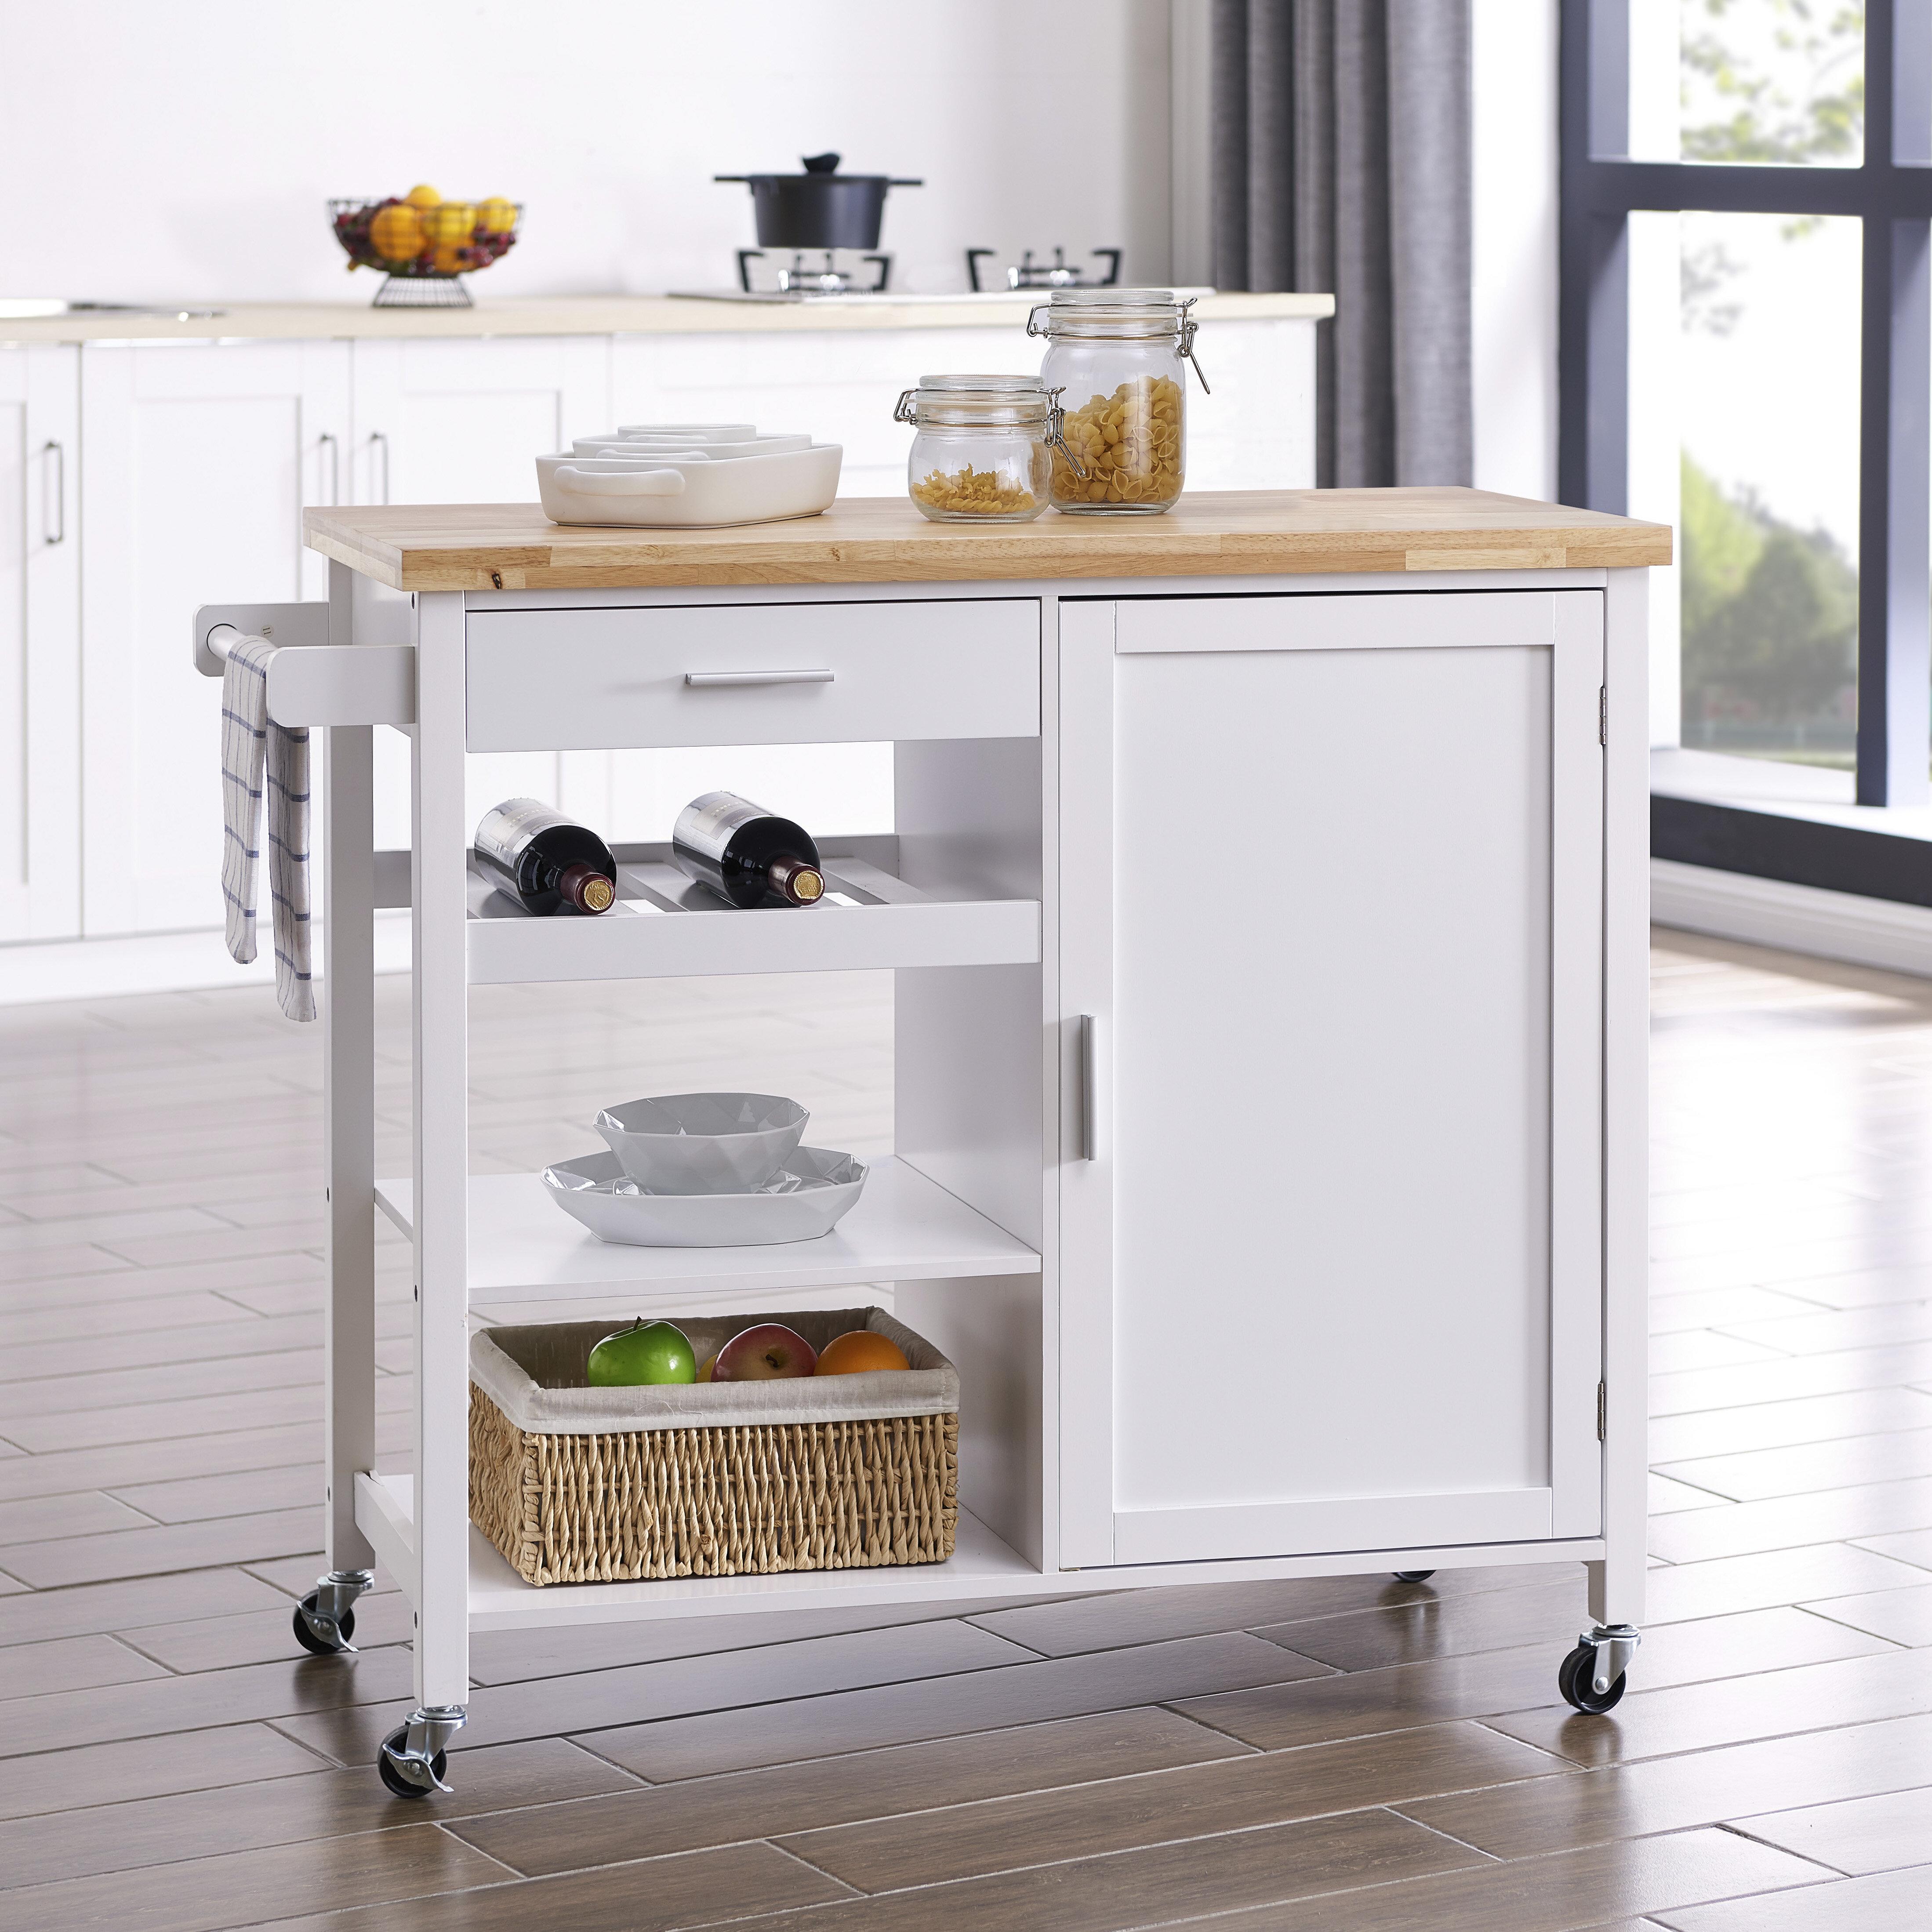 Laude Run Domenique Kitchen Cart